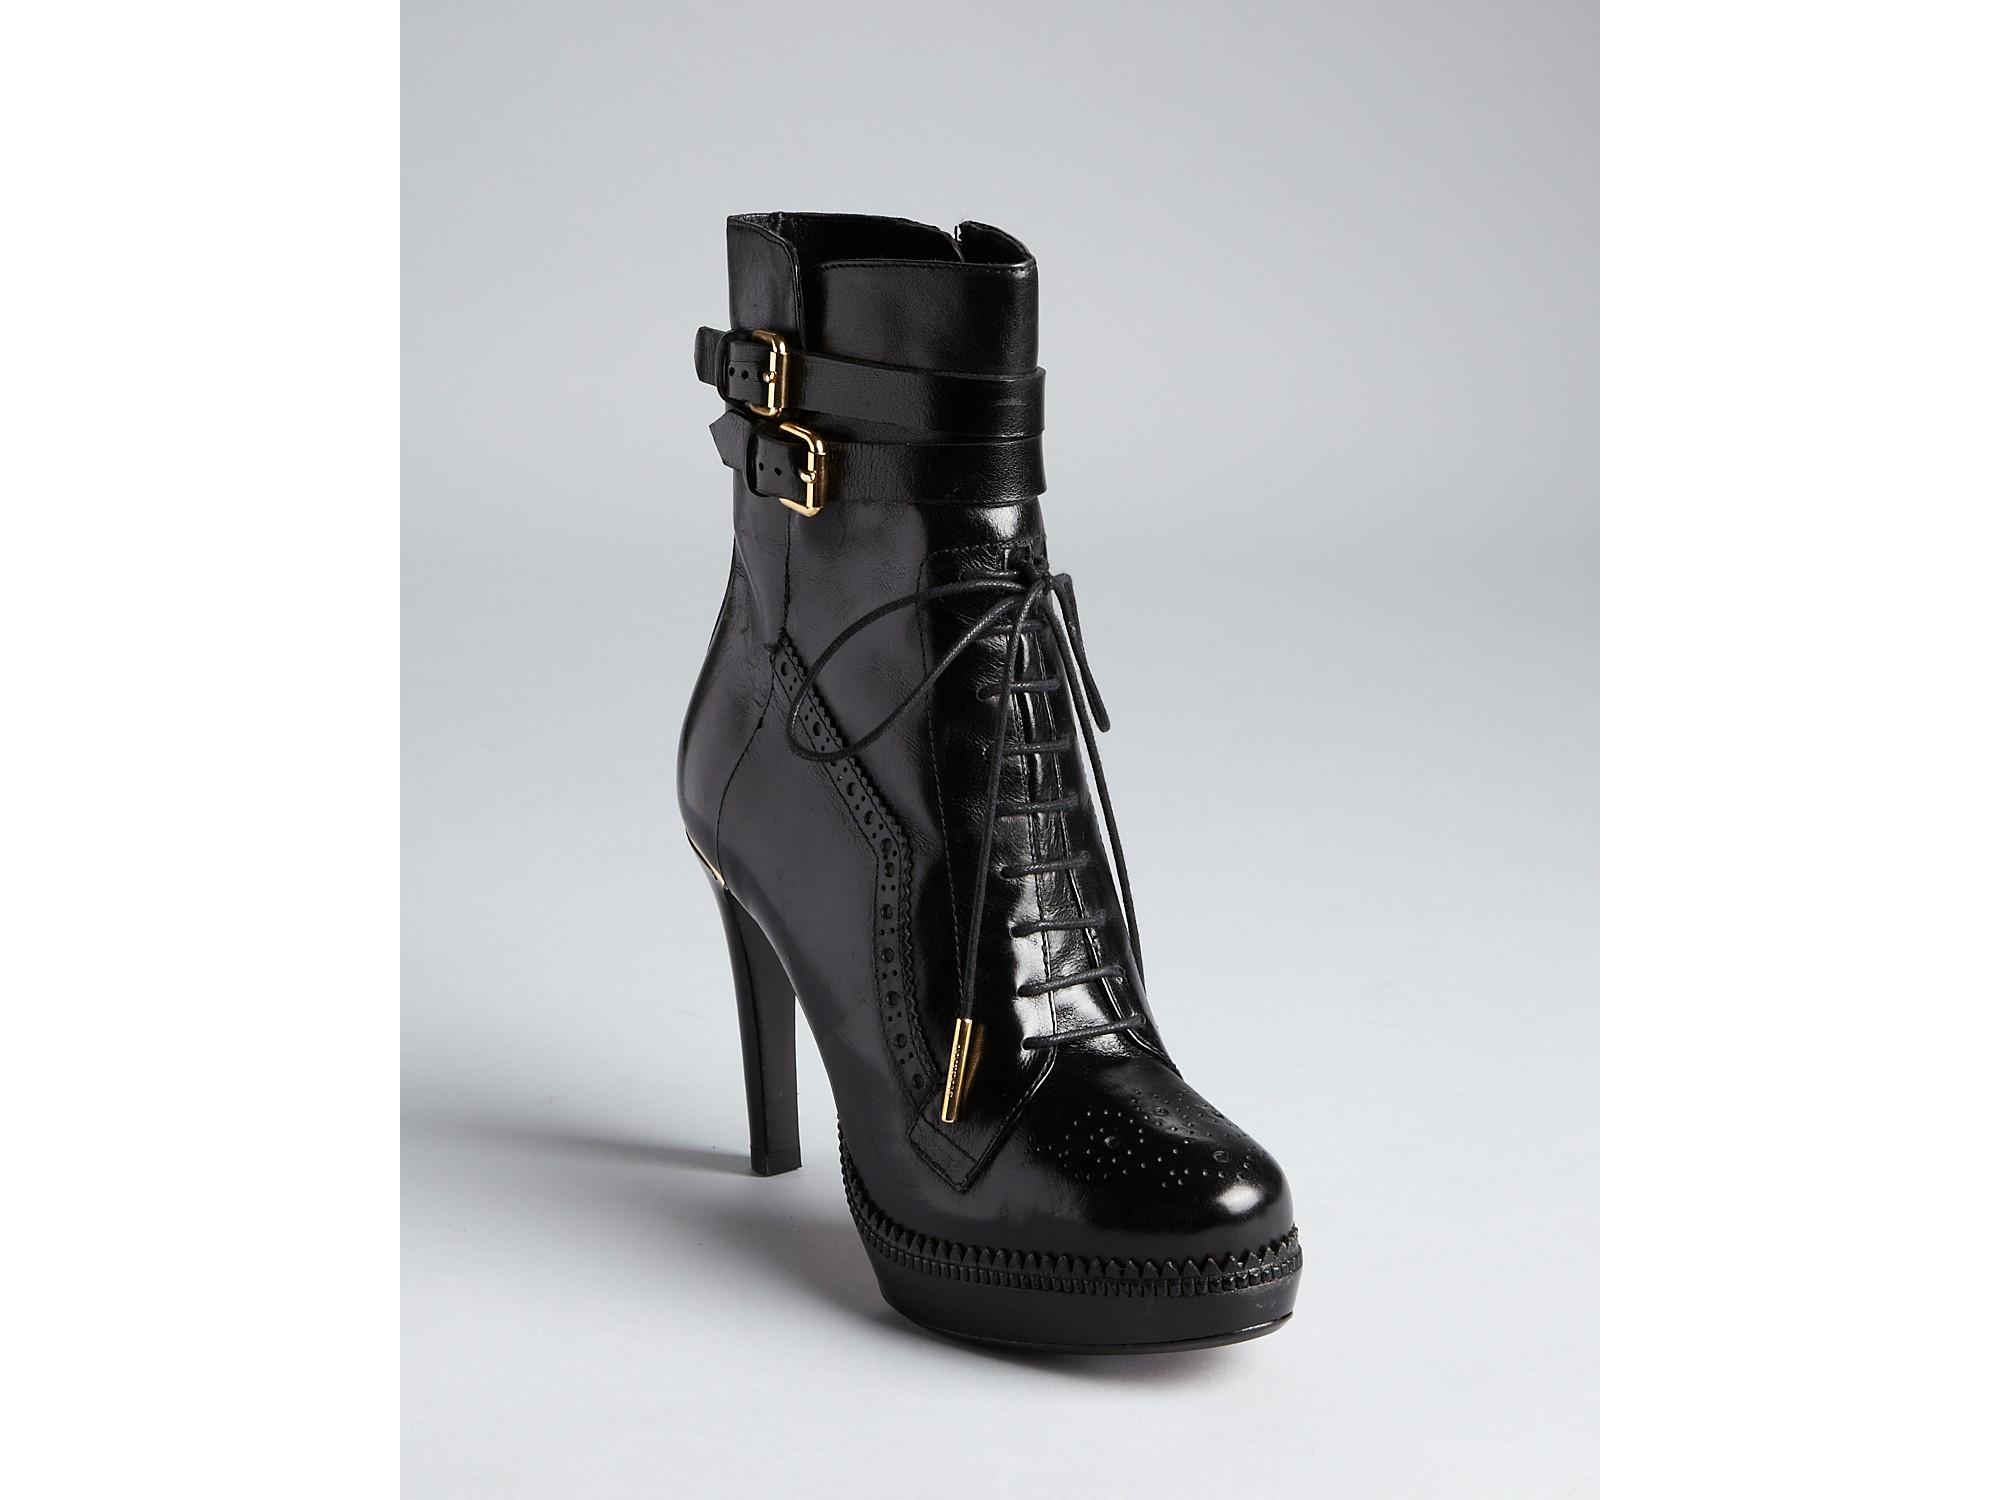 840d5f63eef1e Burberry Black Ankle Boots Brogue Daleside Lace Up Platform